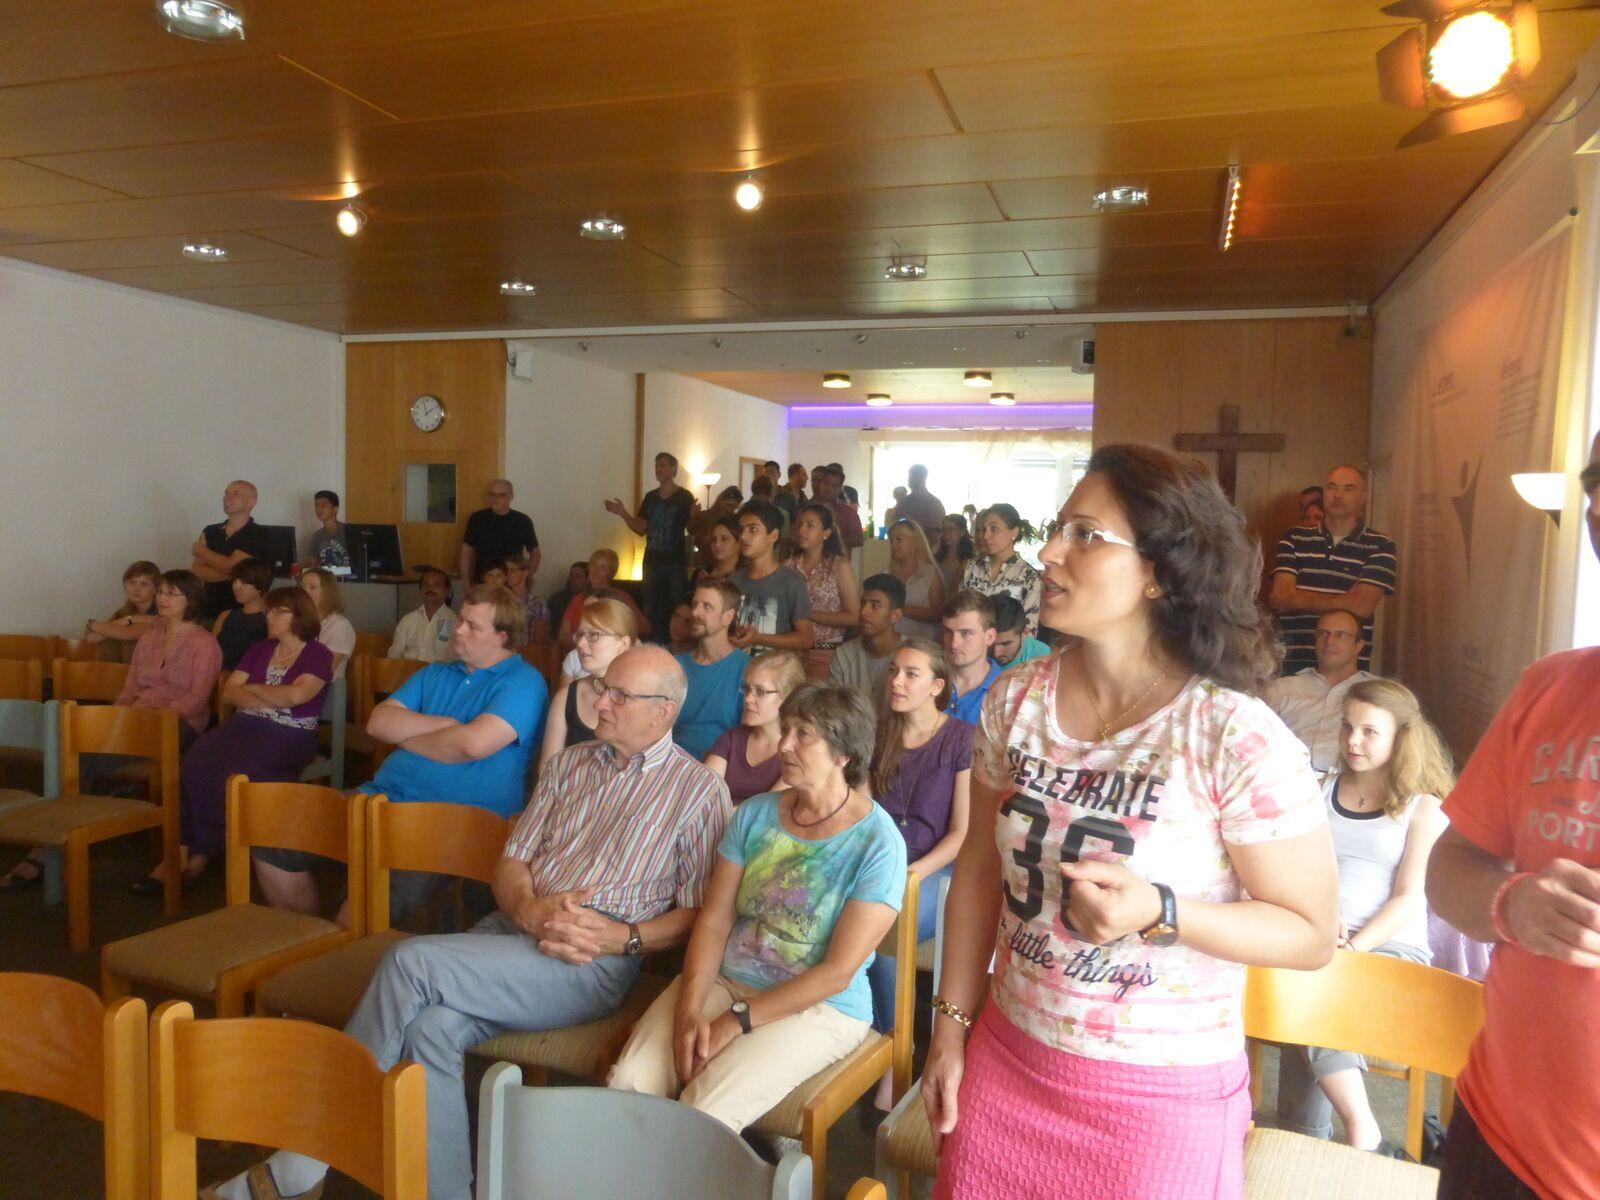 Evangelische Seestraßengemeinde meets Iranische Gemeinde